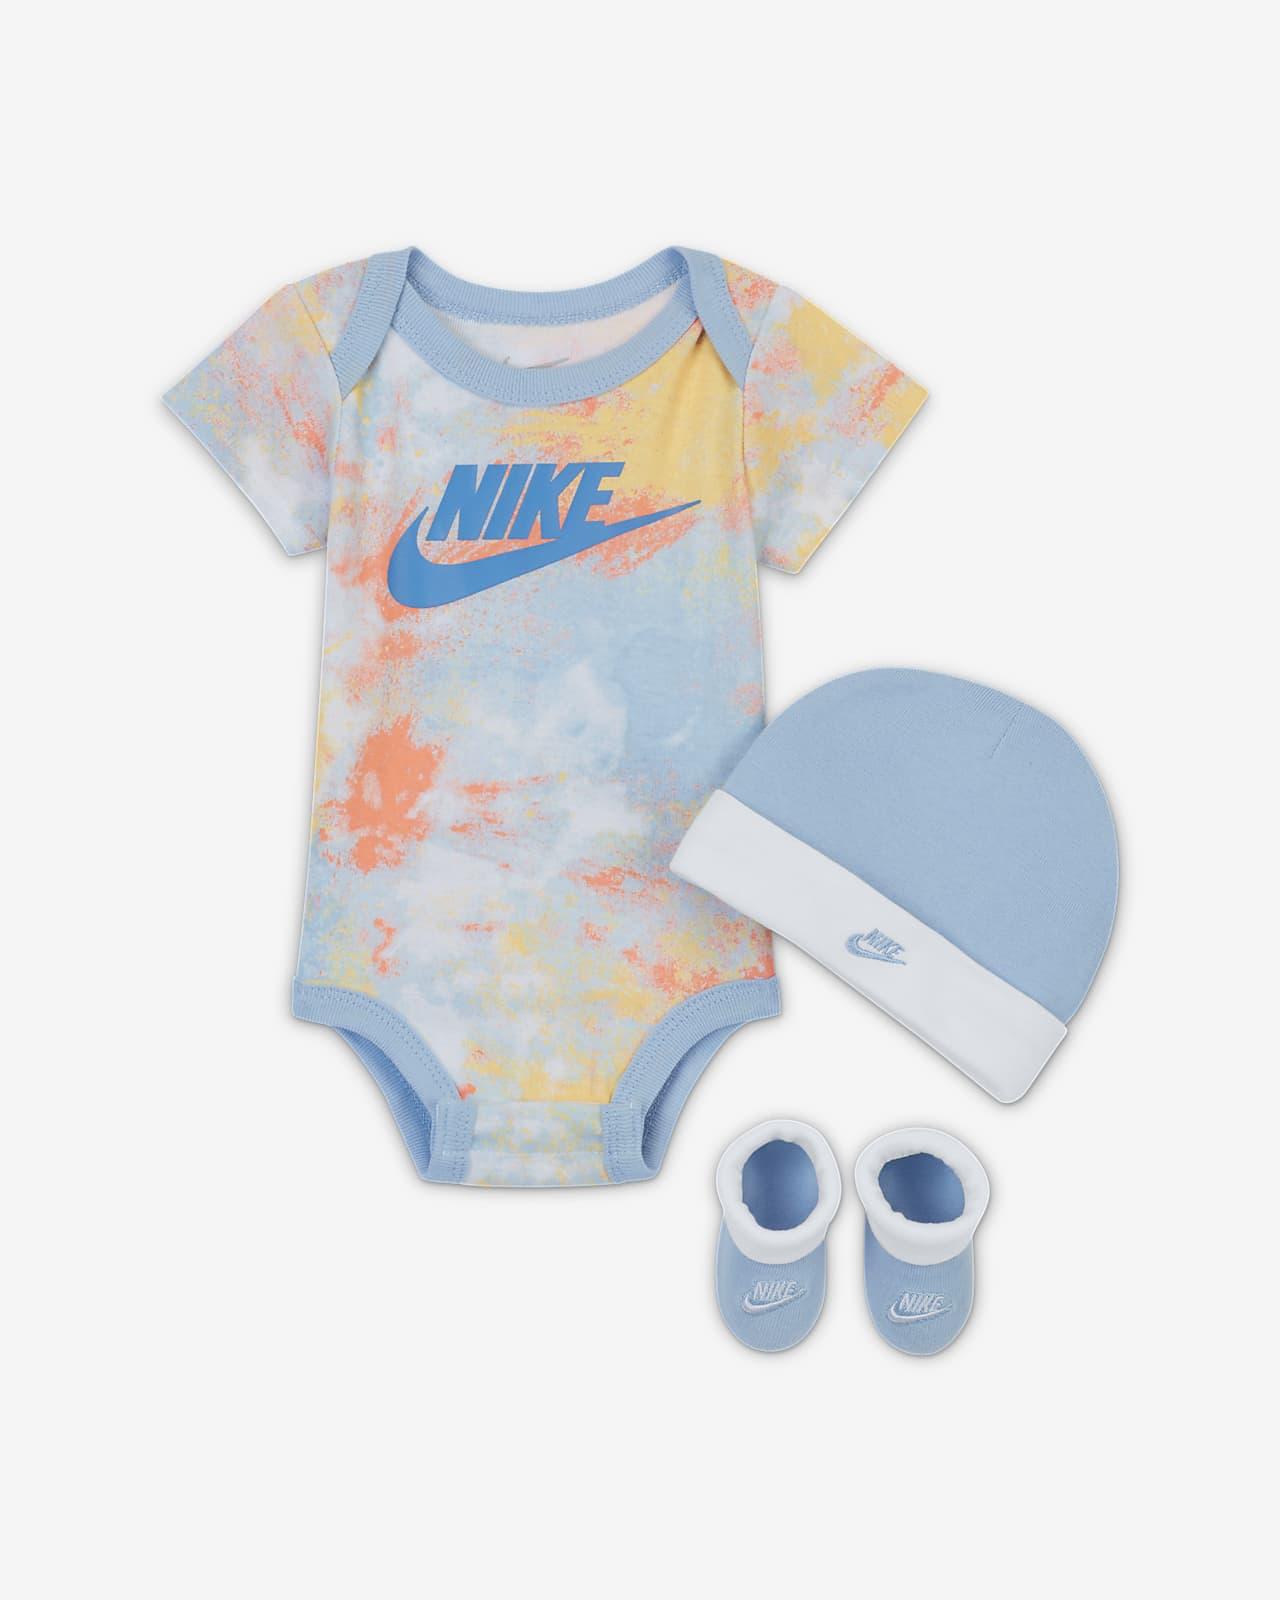 Nike Baby Tie-Dye 3-Piece Box Set